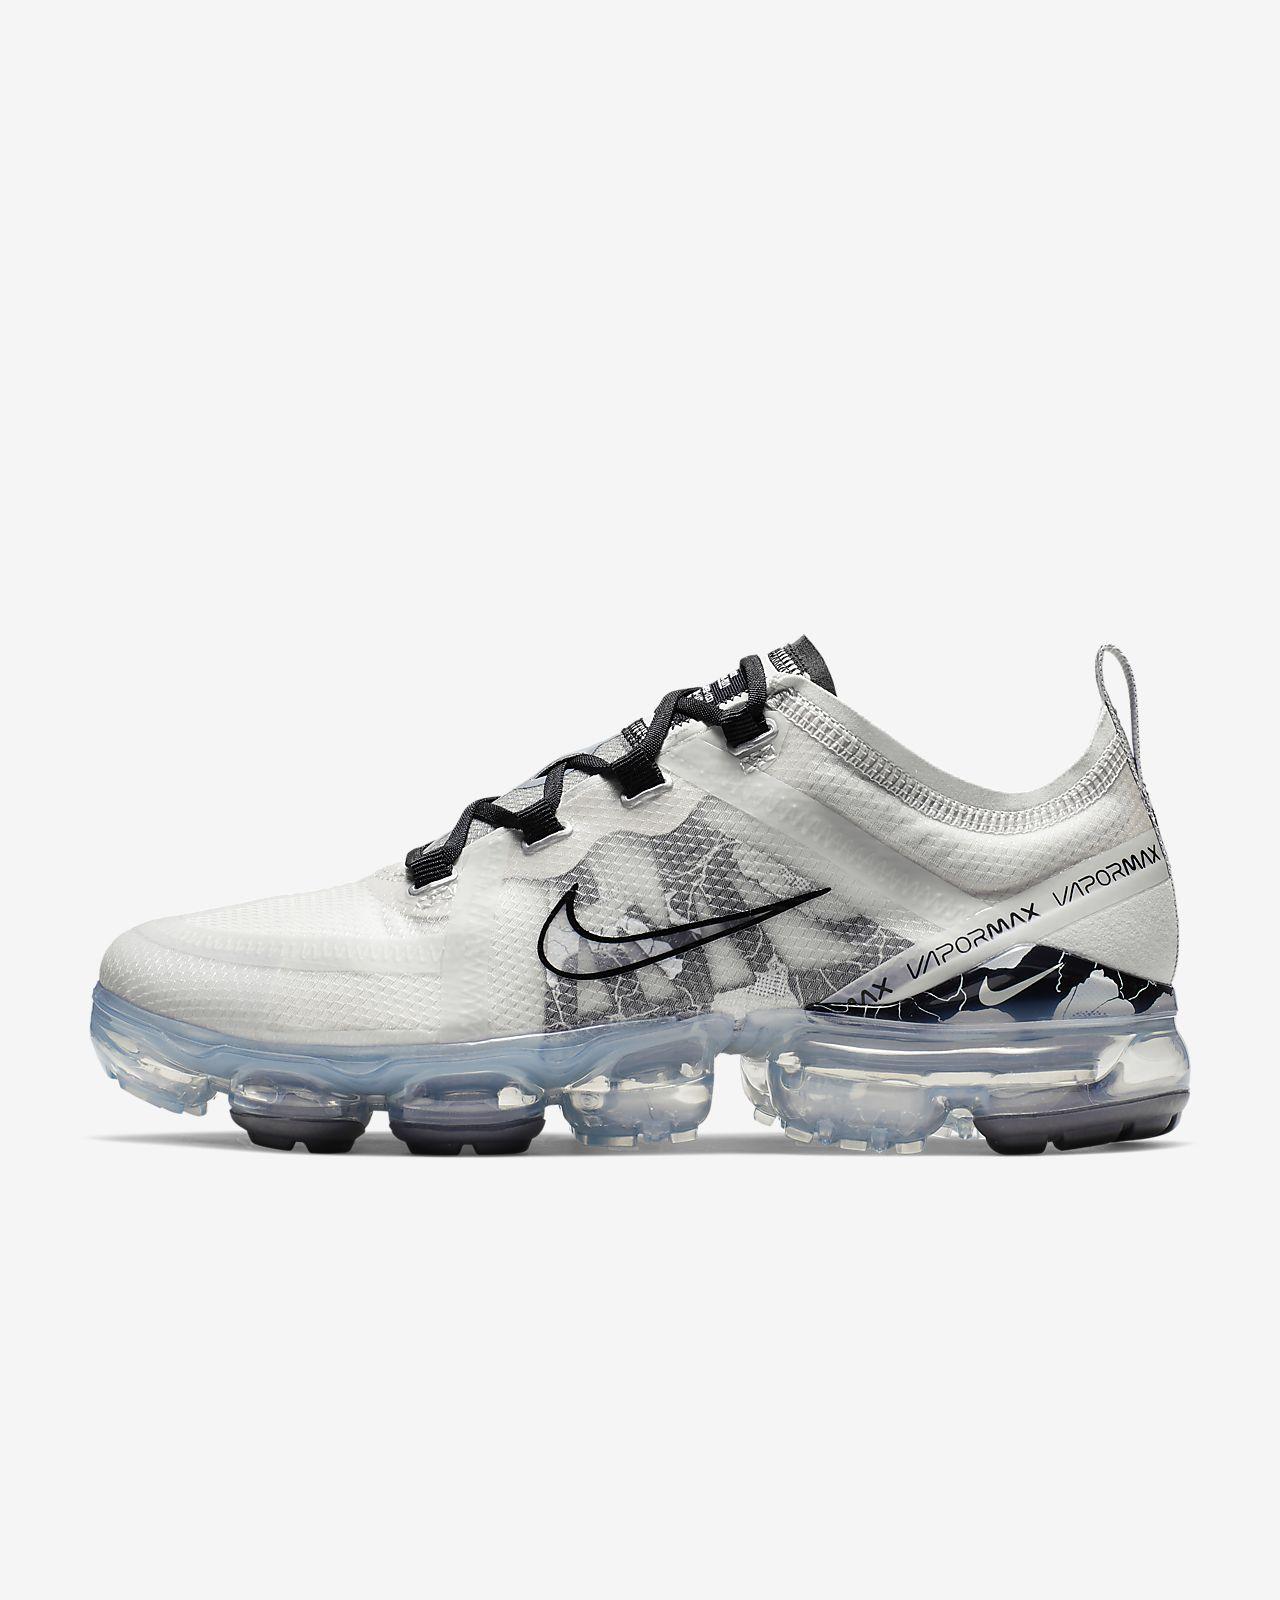 new style 2ba42 7a8cf Nike Air VaporMax 2019 SE